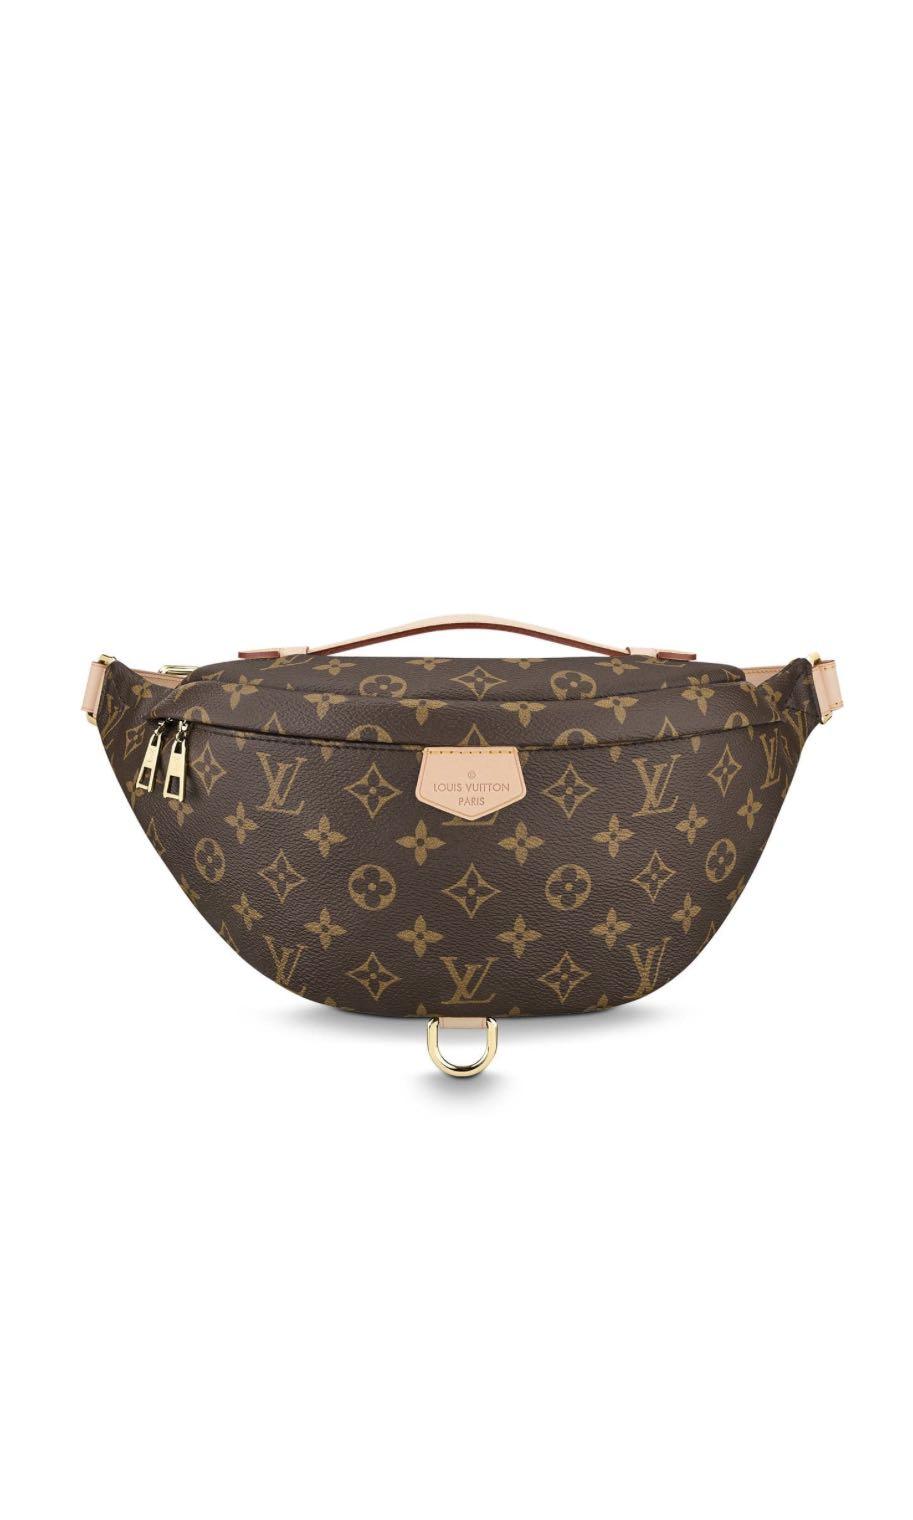 Louis Vuitton Bumbag Sac Ceinture M43644, Luxury, Bags   Wallets ... c14b1d6b6c1